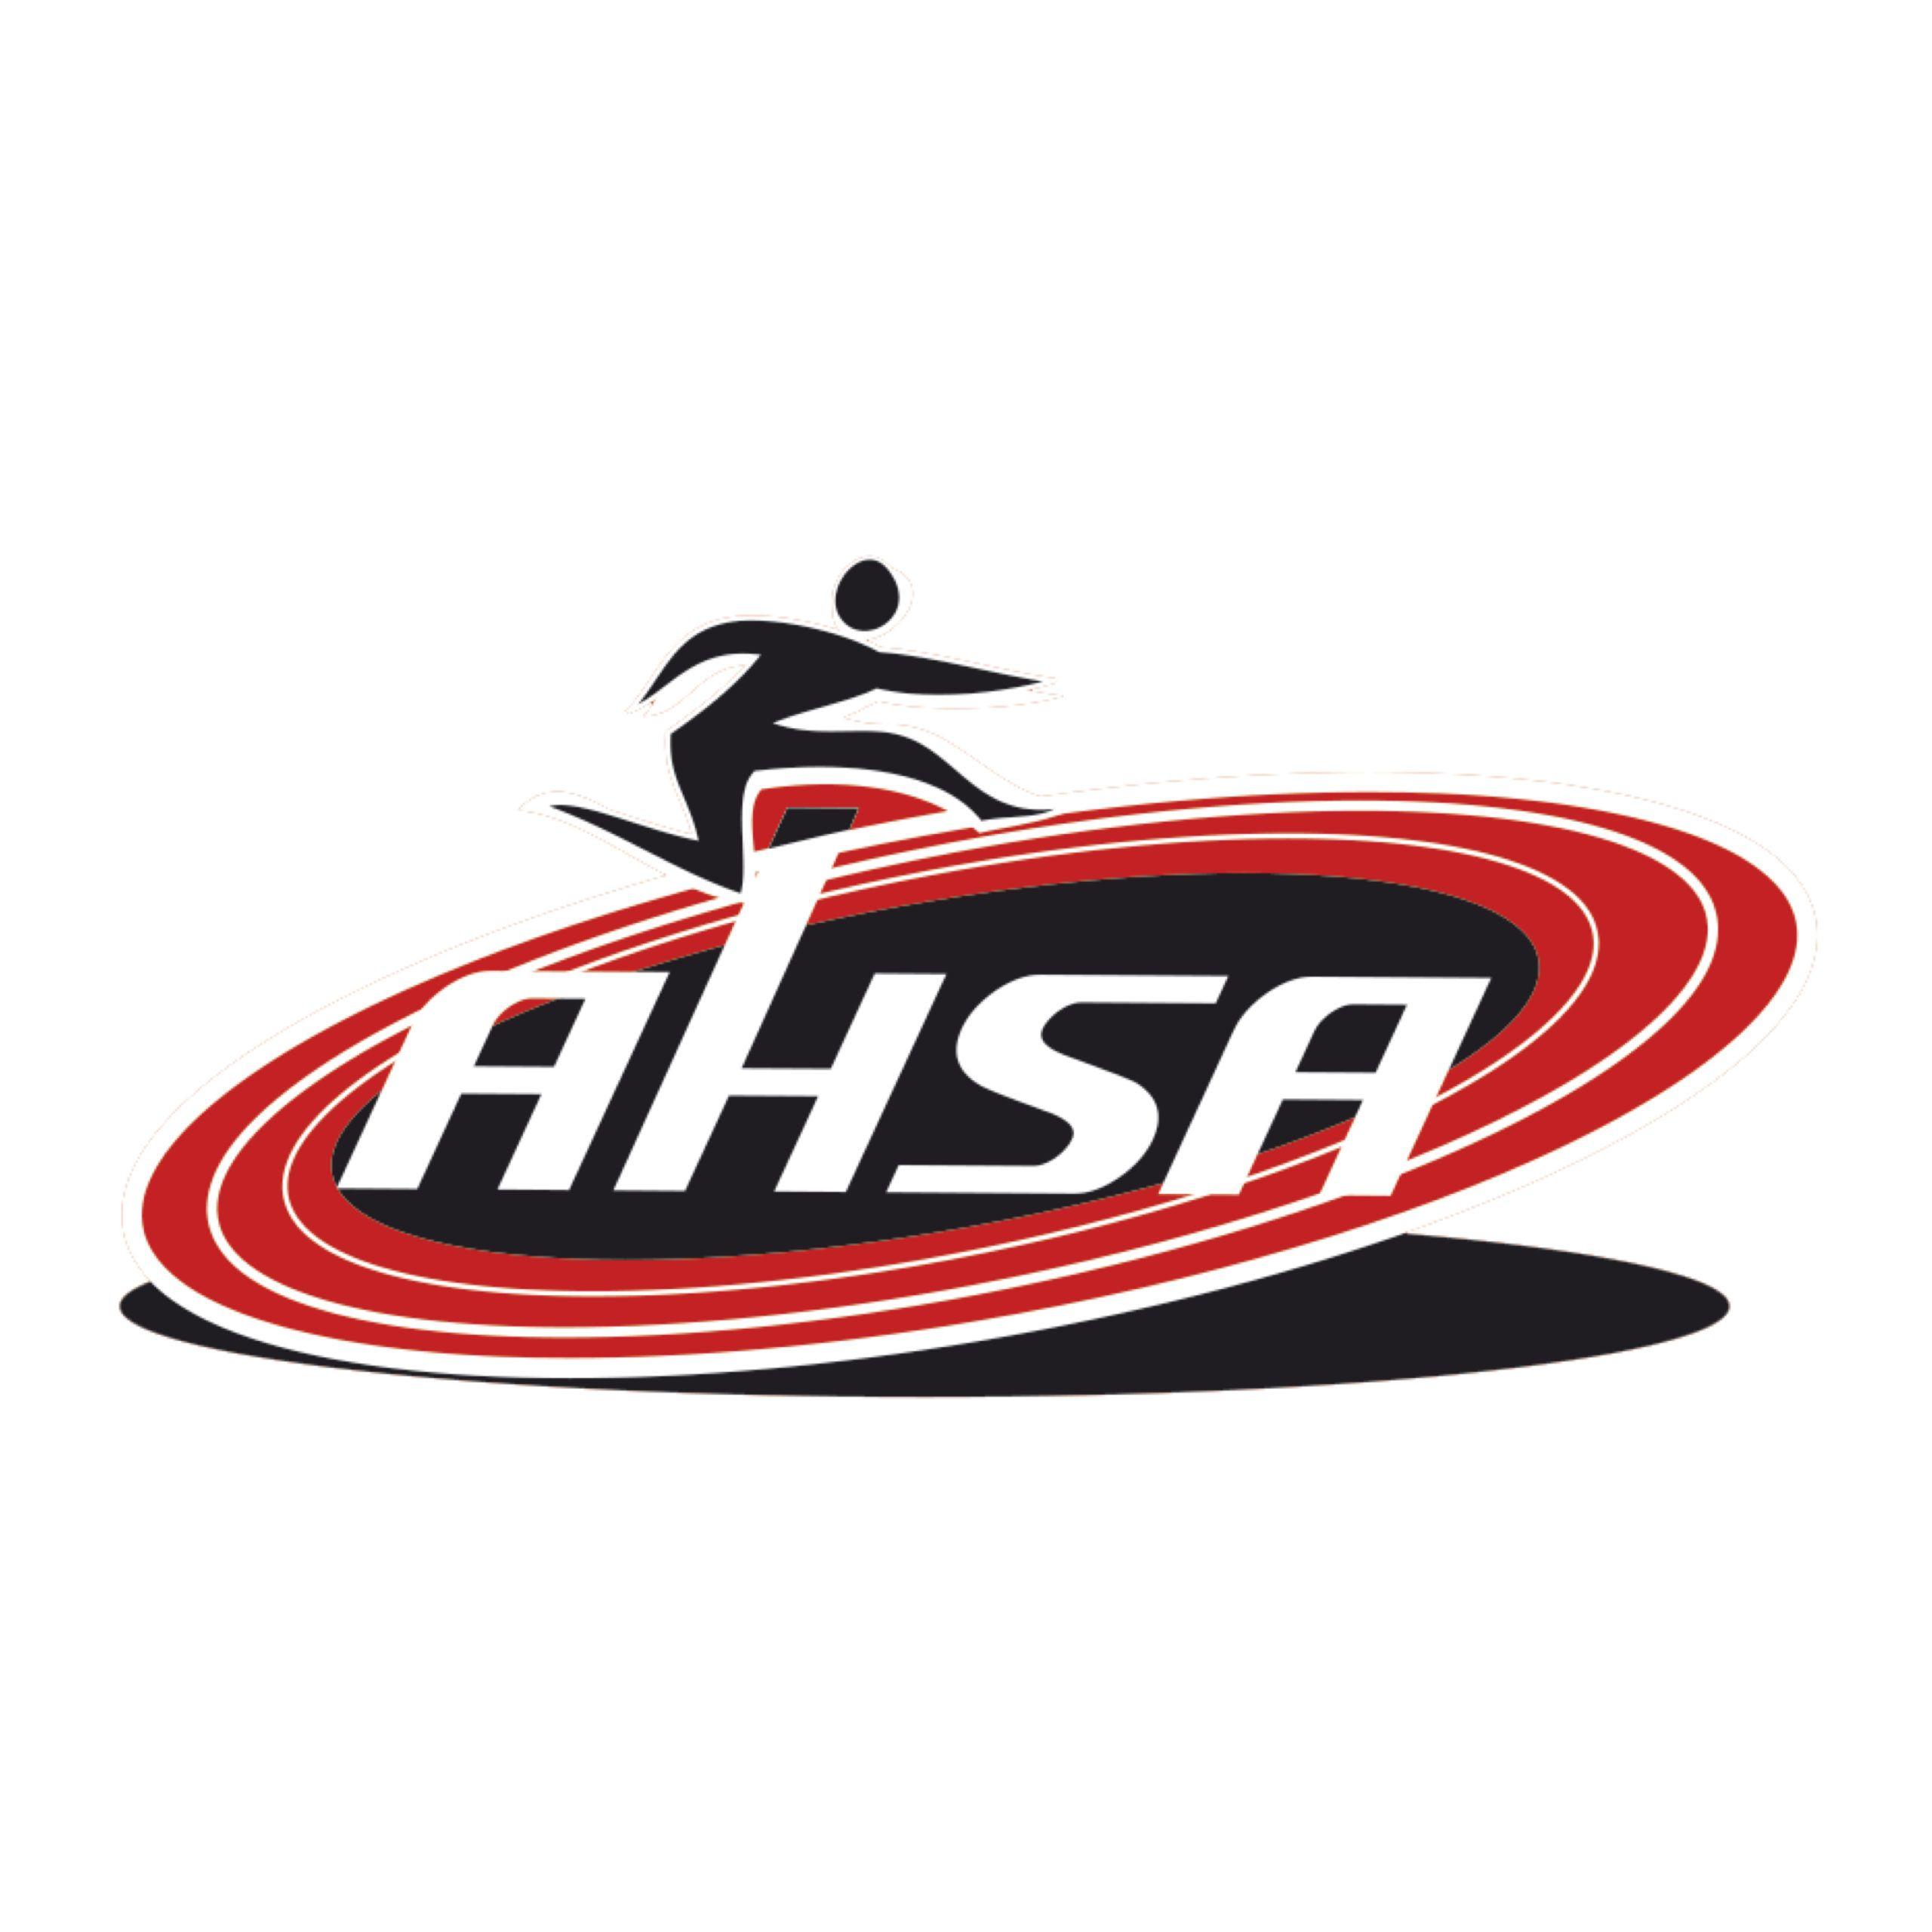 AHSA Athlétisme Annecy